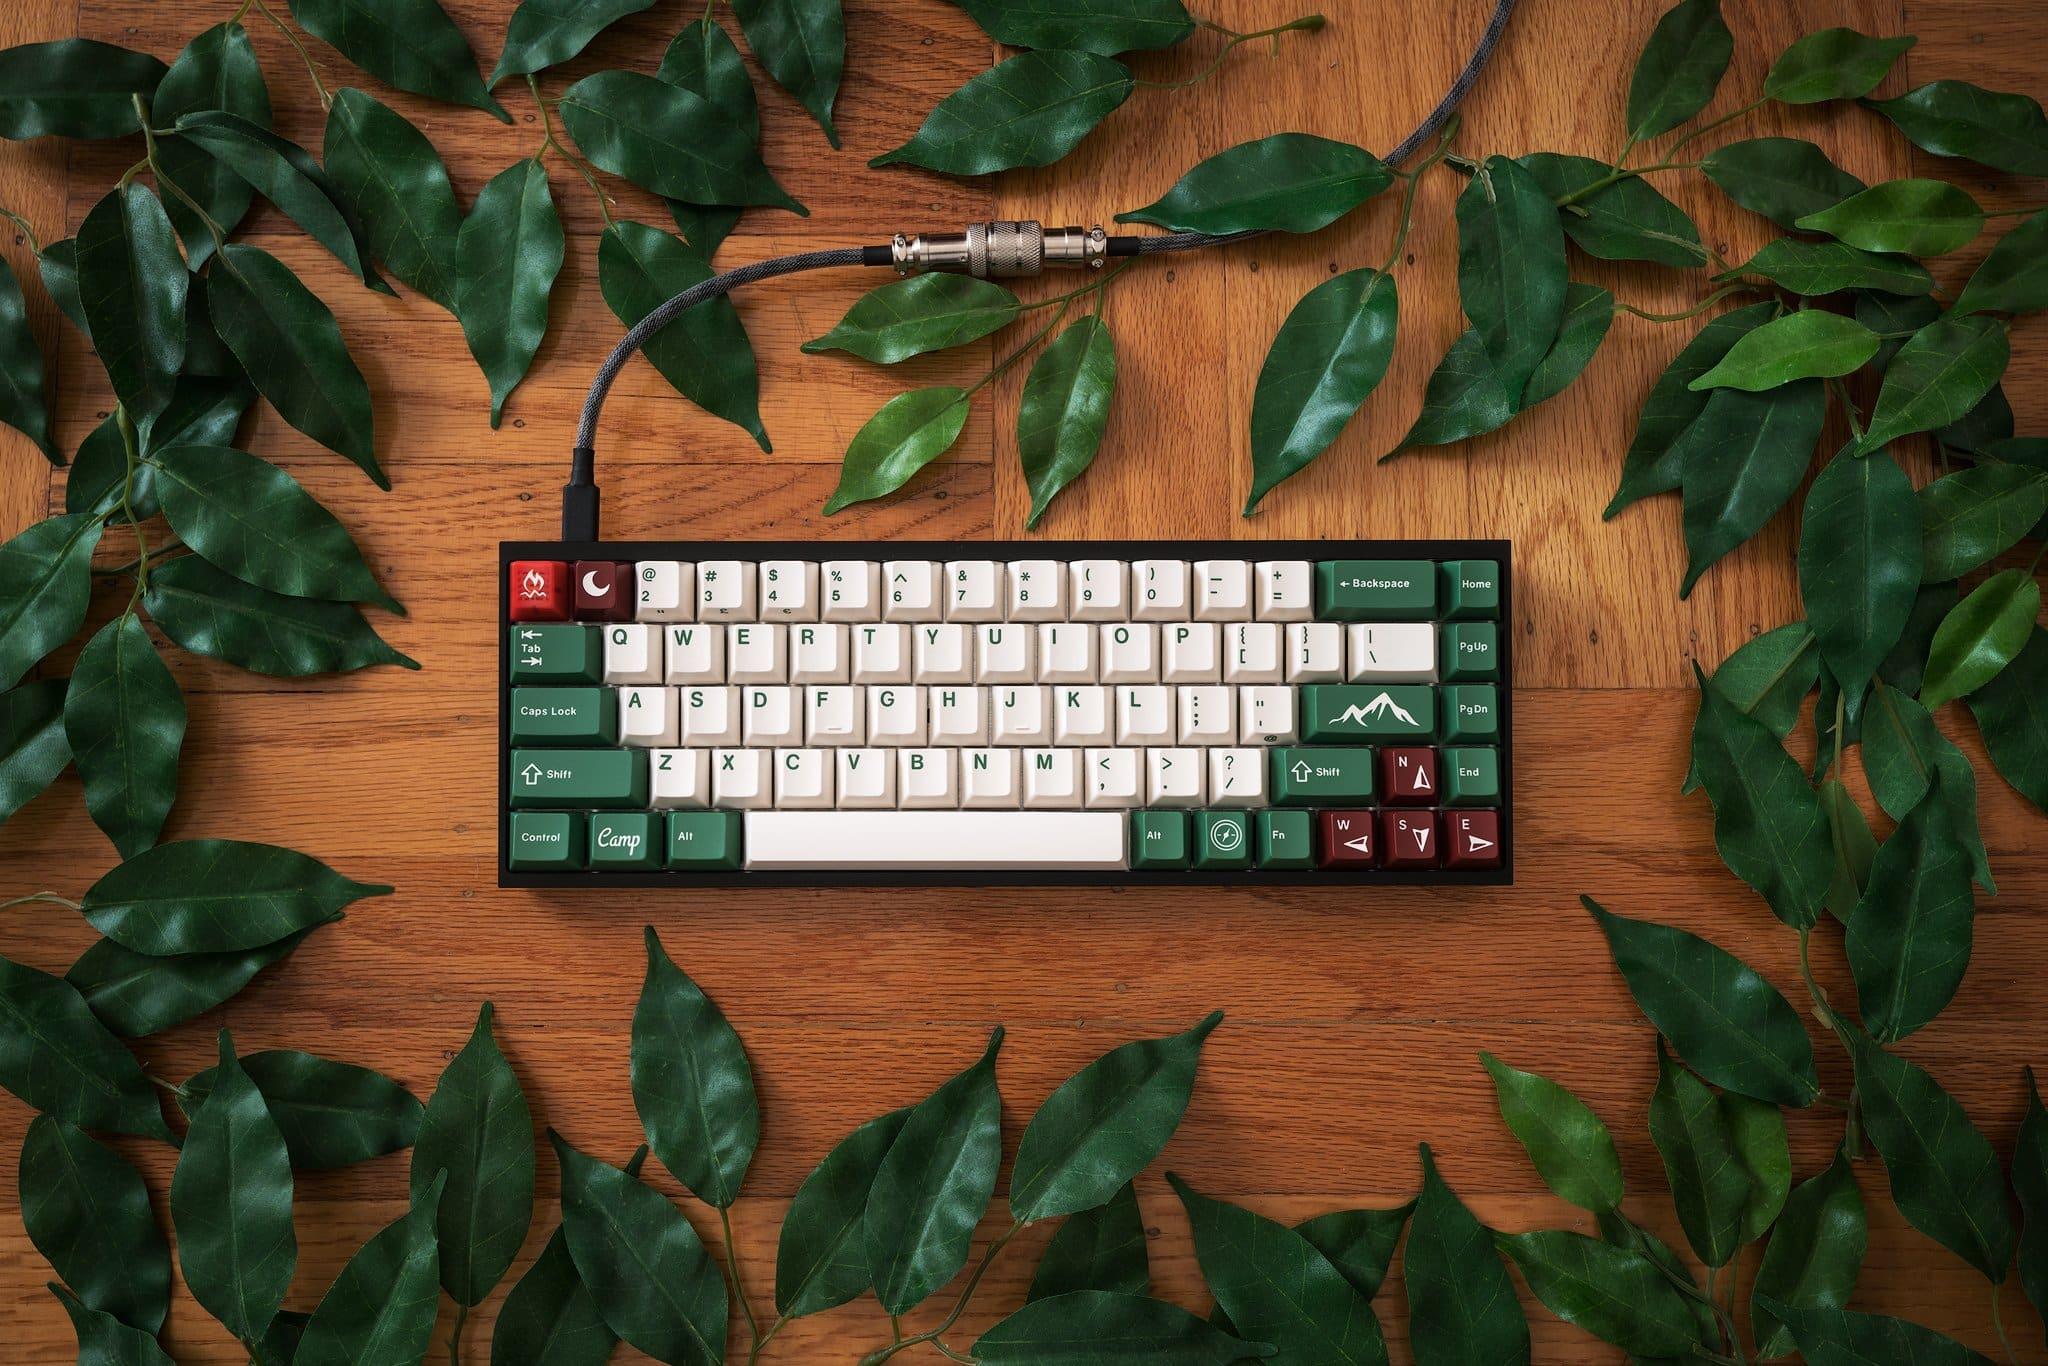 noonite Camping (Mechanical Keyboard)